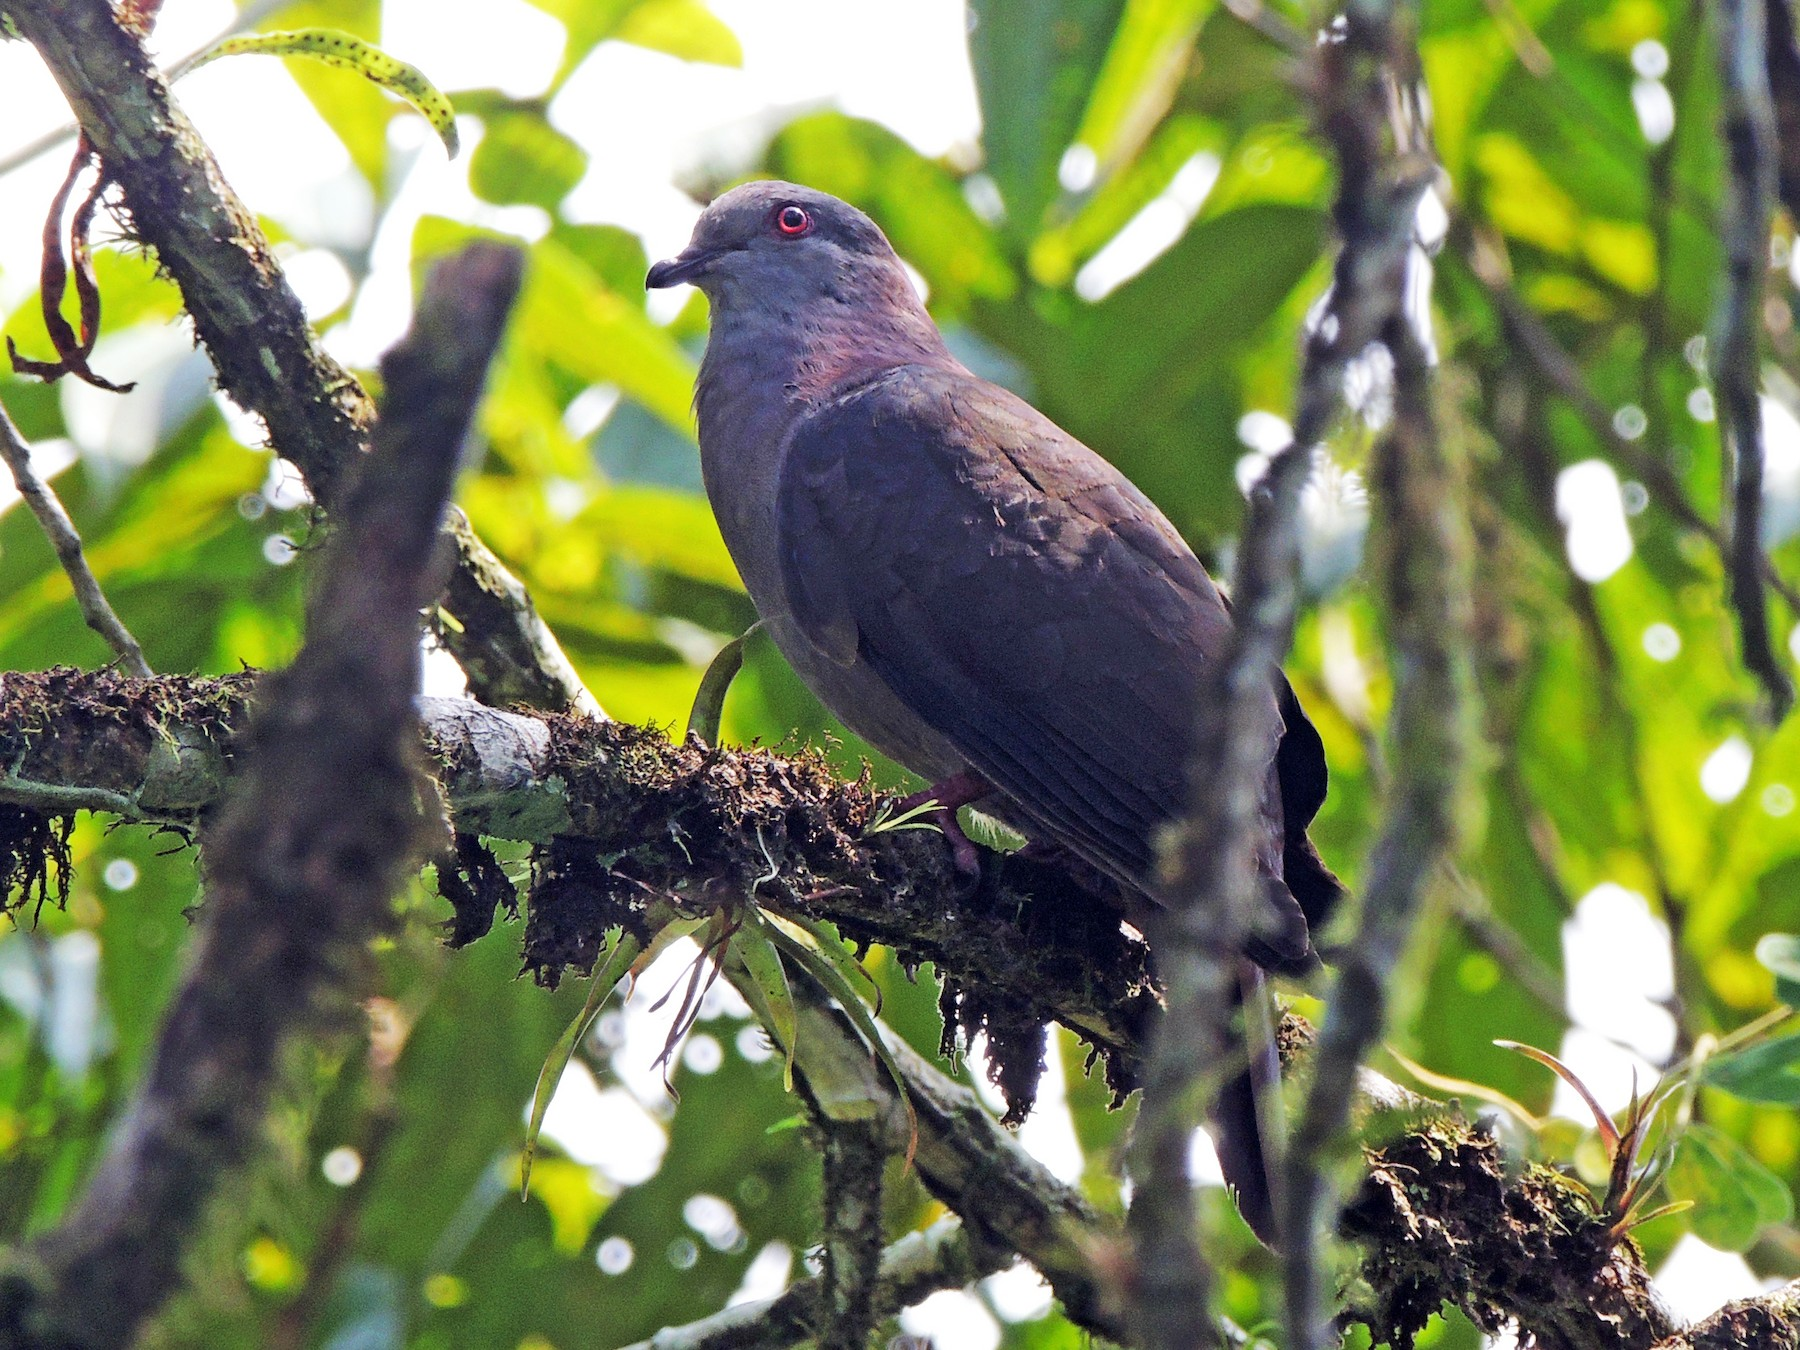 Dusky Pigeon - Ottavio Janni